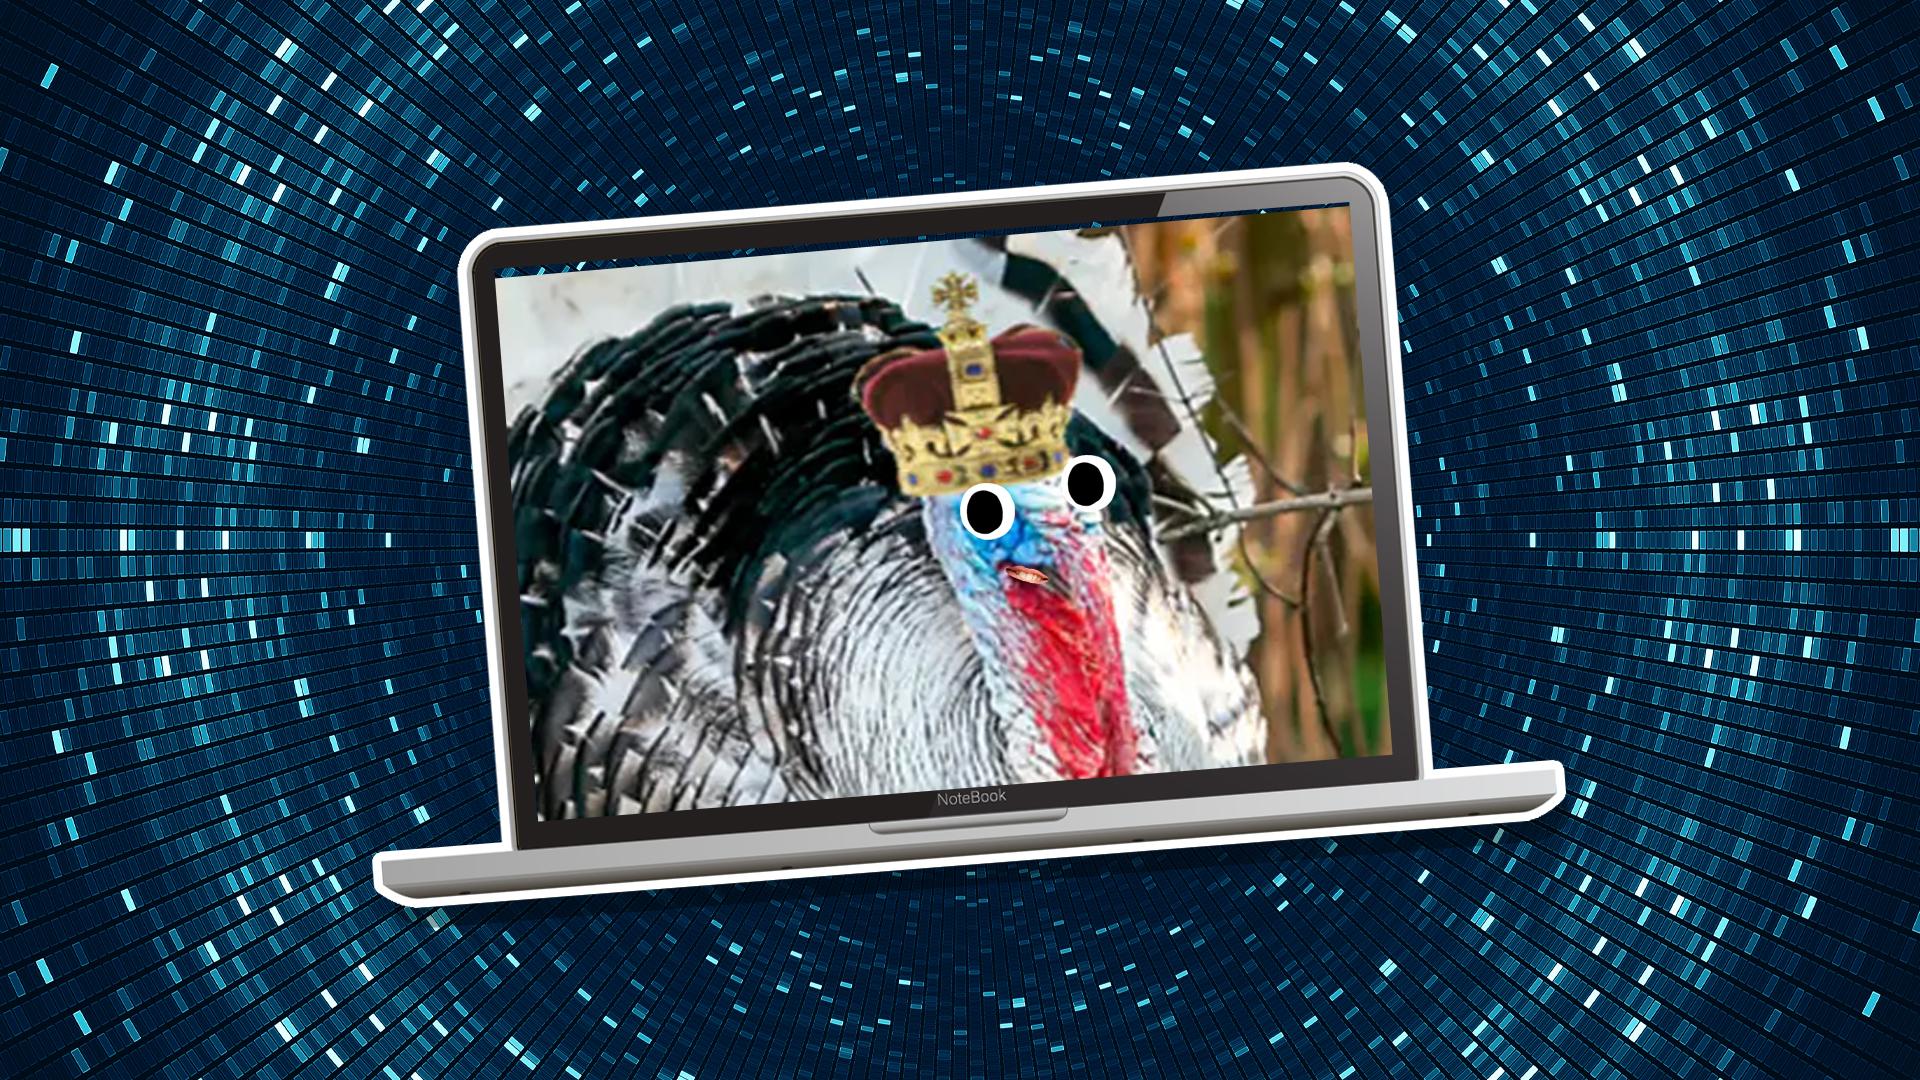 A turkey on the laptop